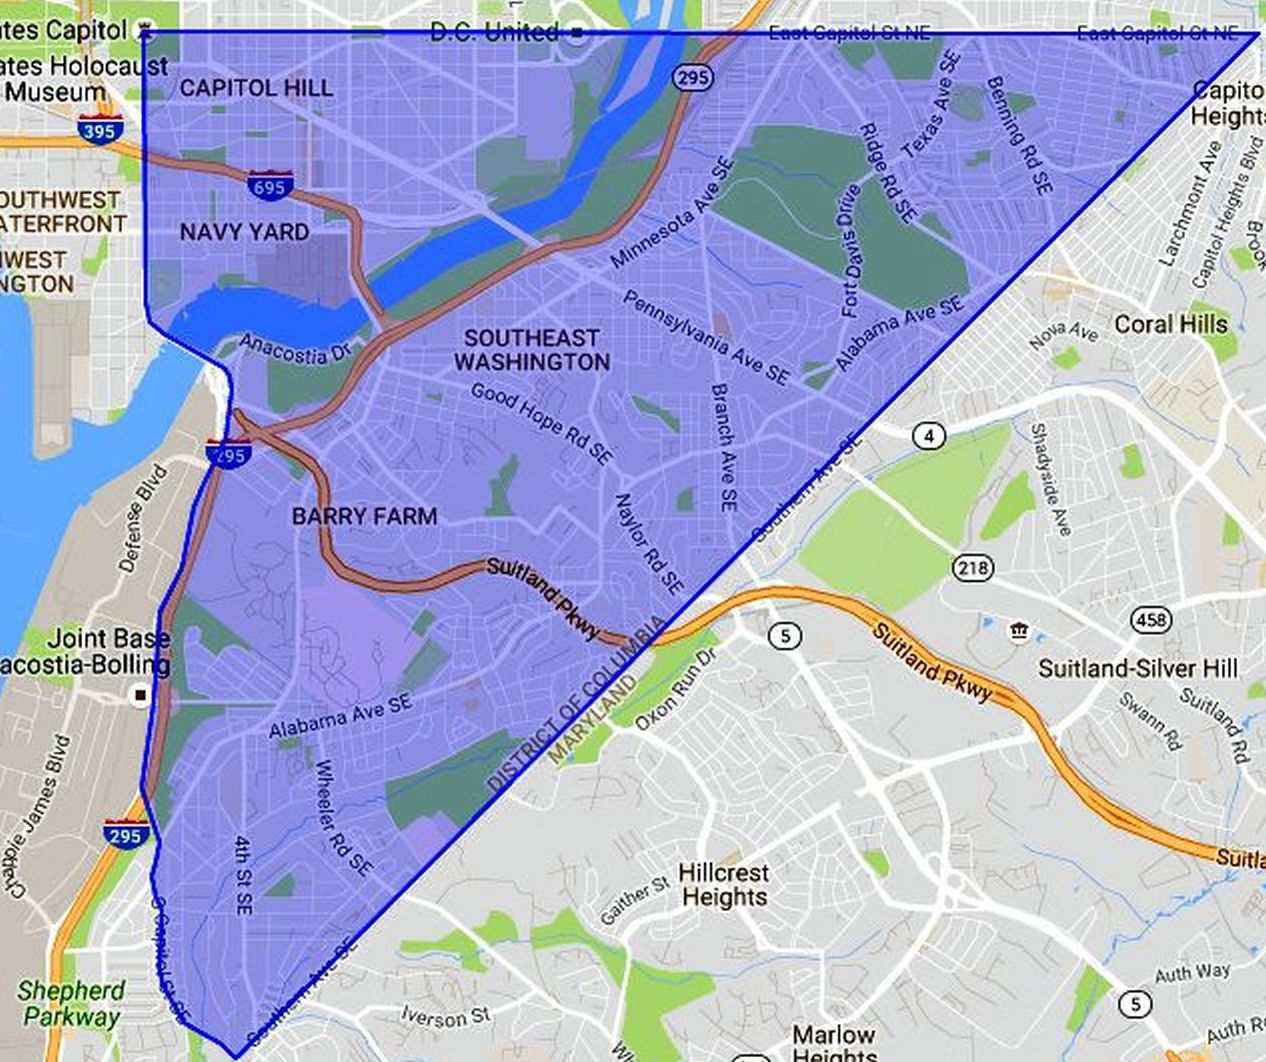 SE Washington DC: A Map and Neighborhood Guide on